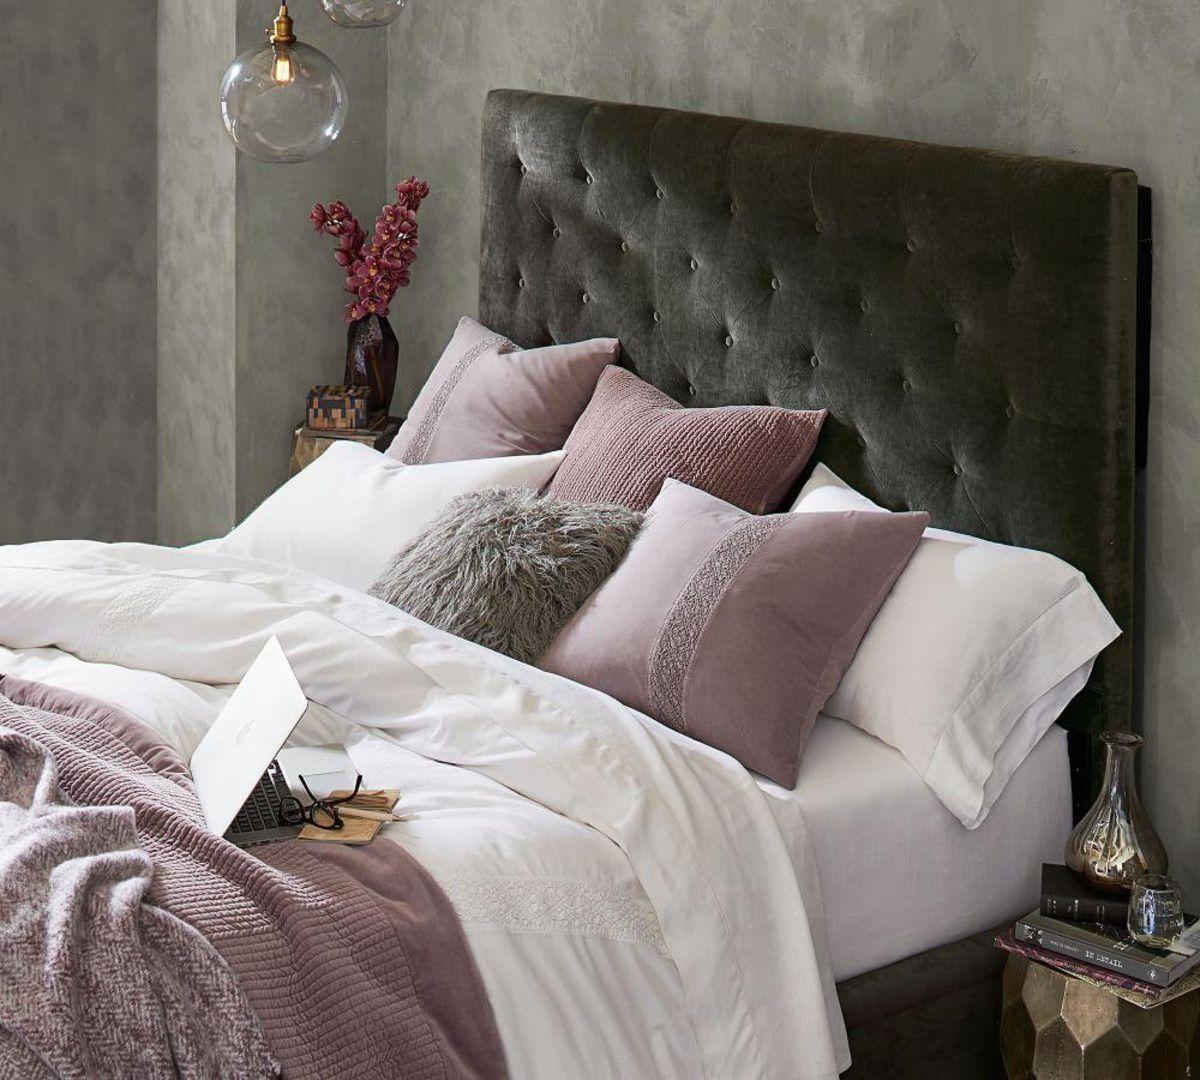 Lorraine Tufted Tall Bed Headboard Tall Bed Headboards